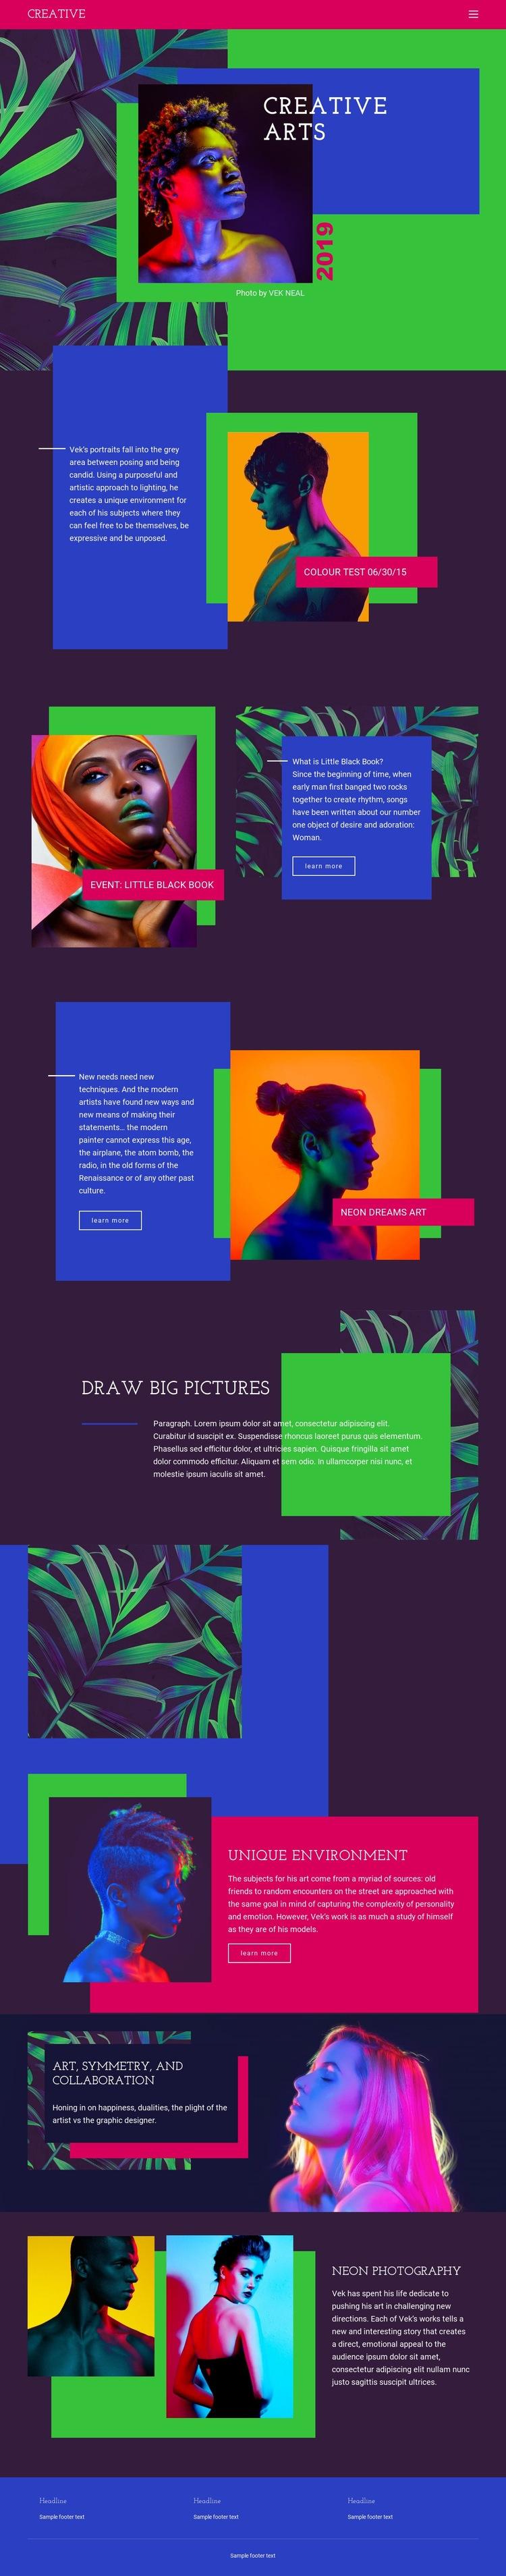 Creative Art Ideas Html Code Example